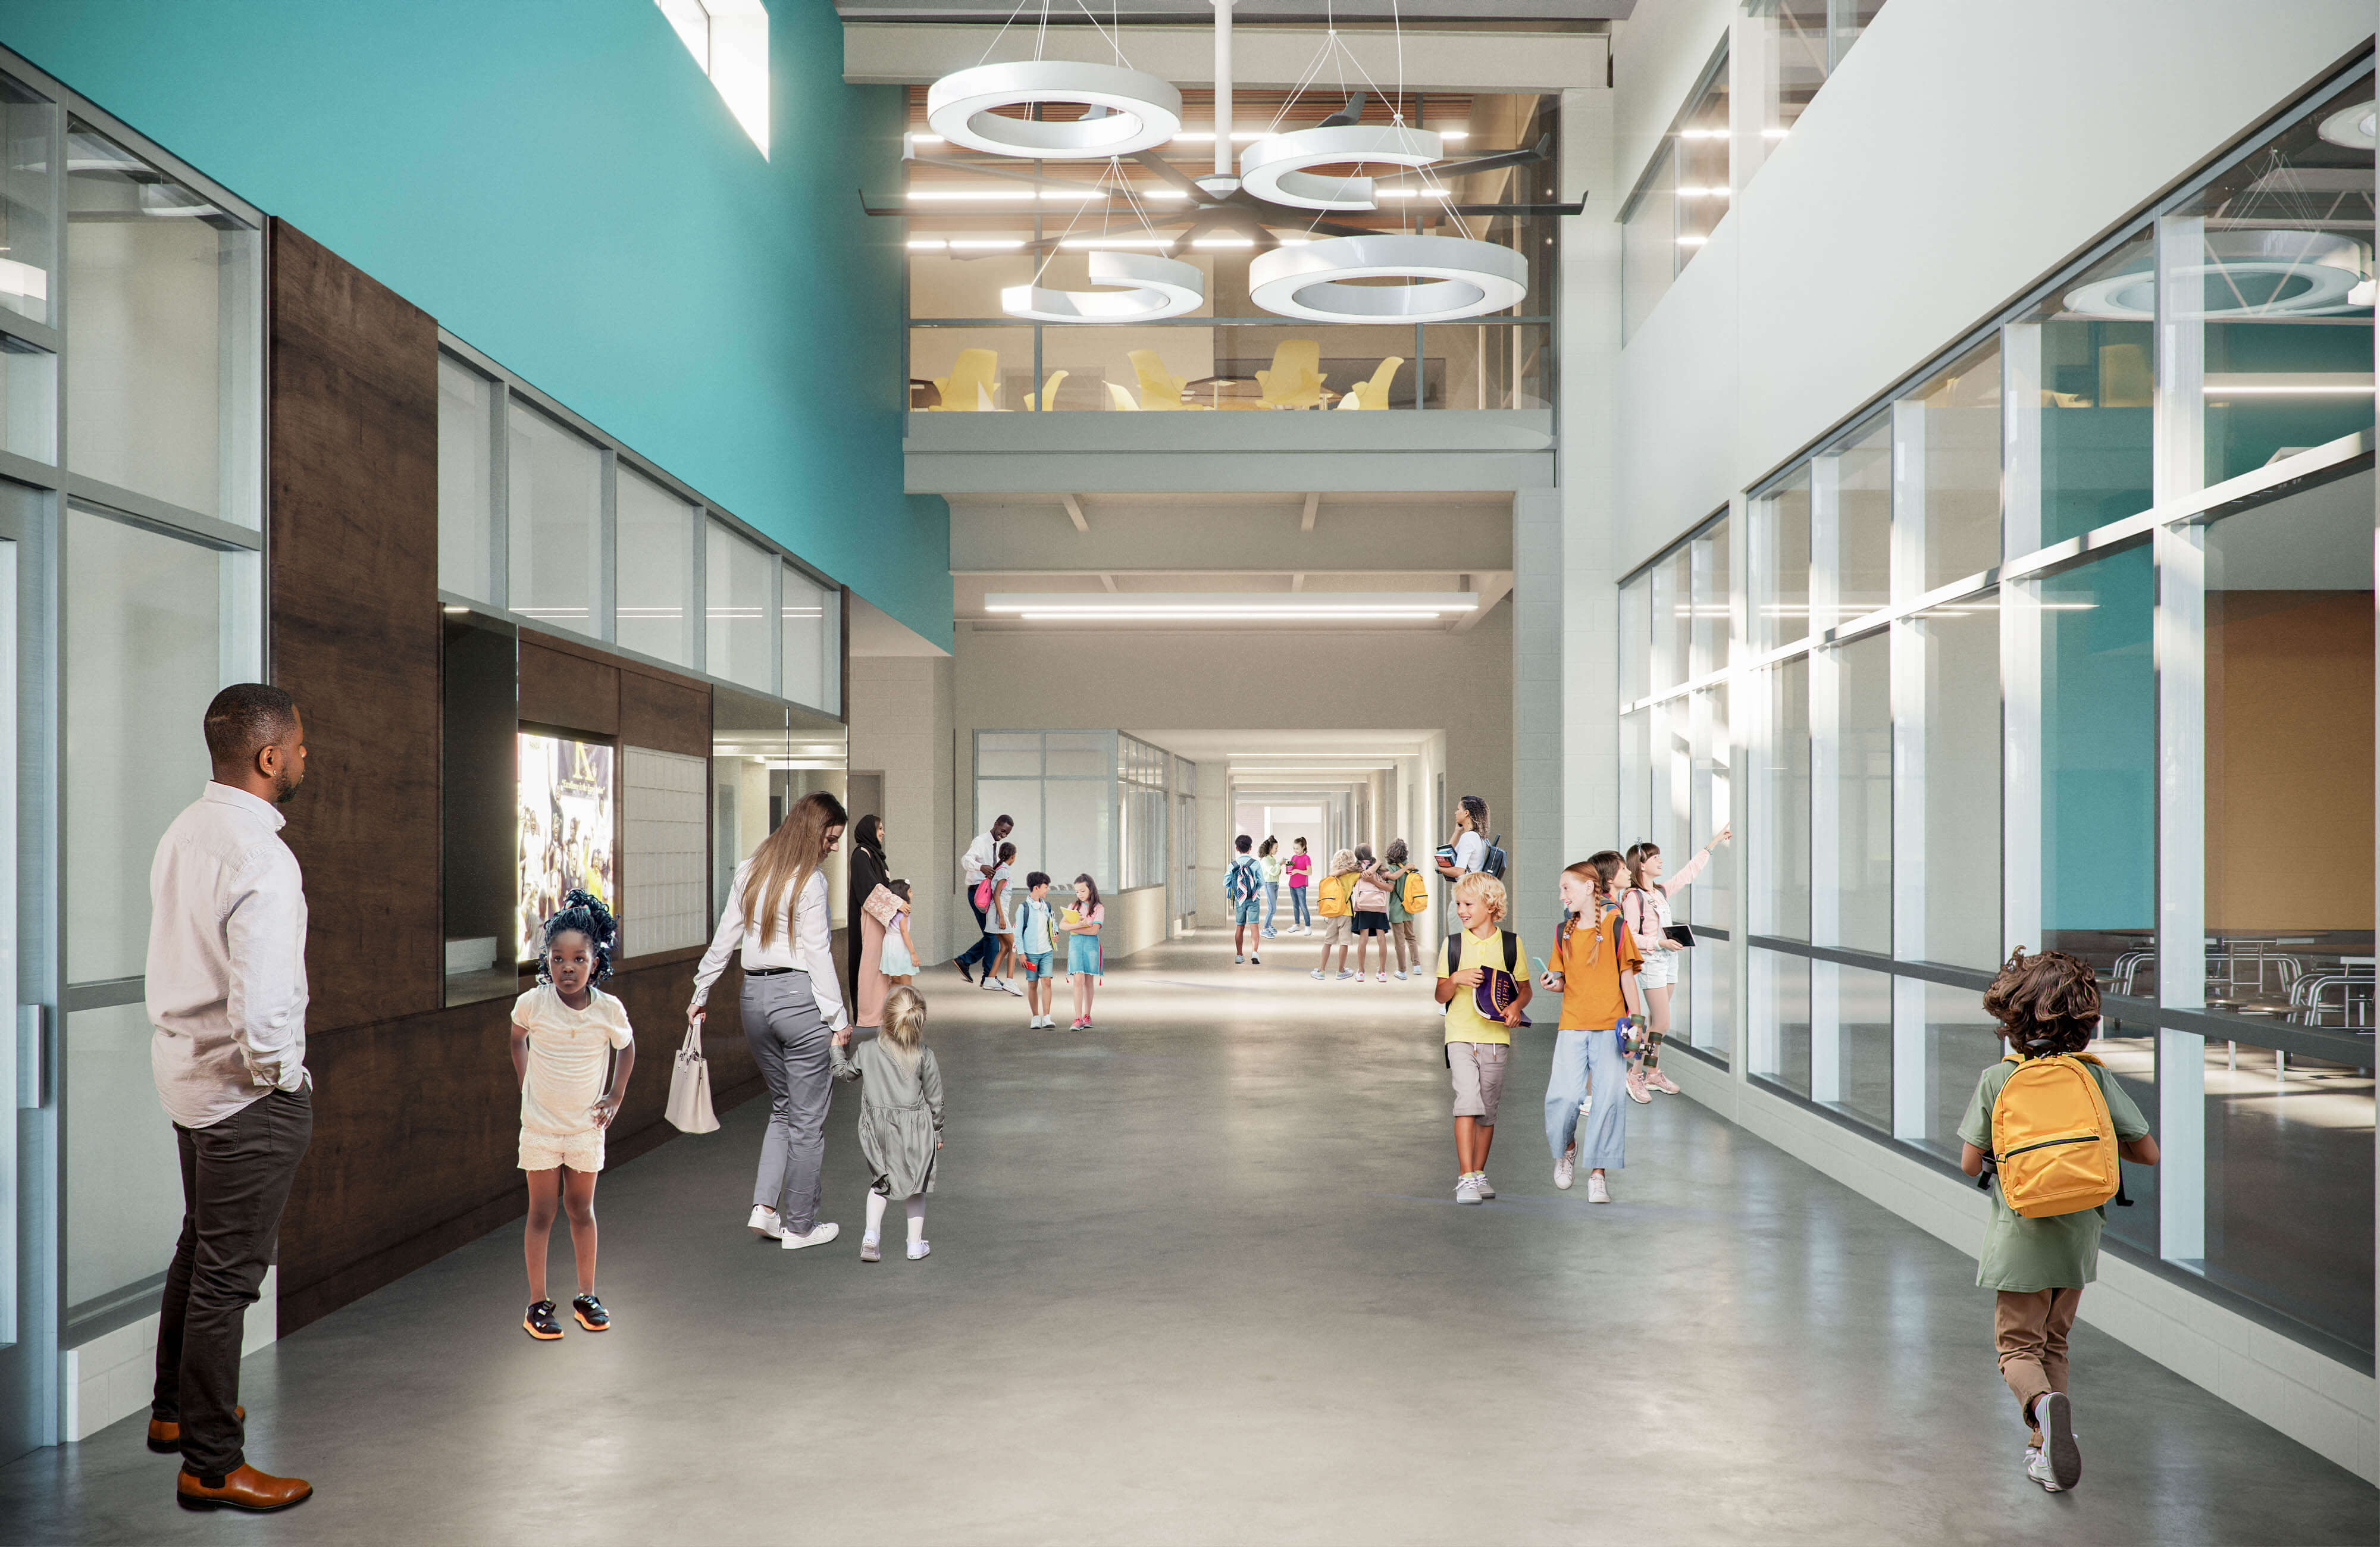 JCPS-WestBroadwayElementarySchool-lobby